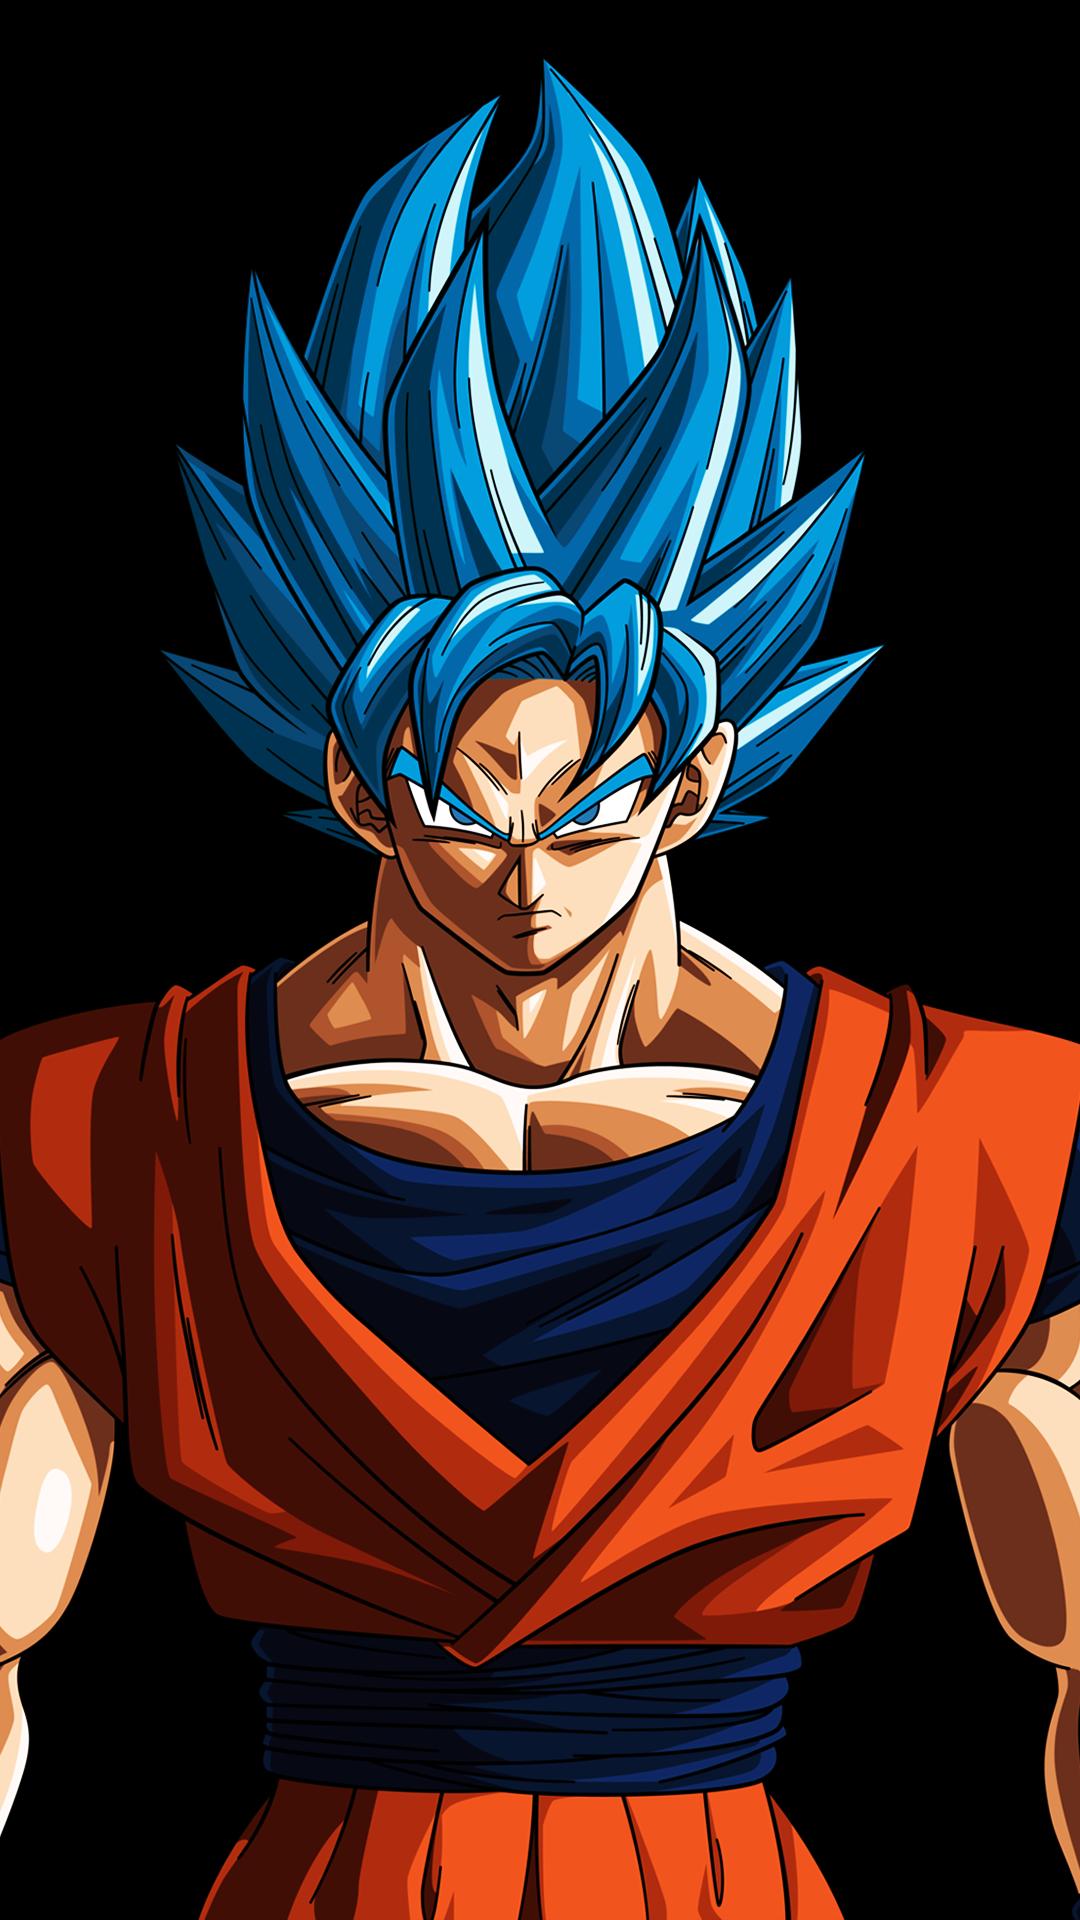 Goku SSJ Blue Evolution! [1080x1920] (i.redd.it) submitted